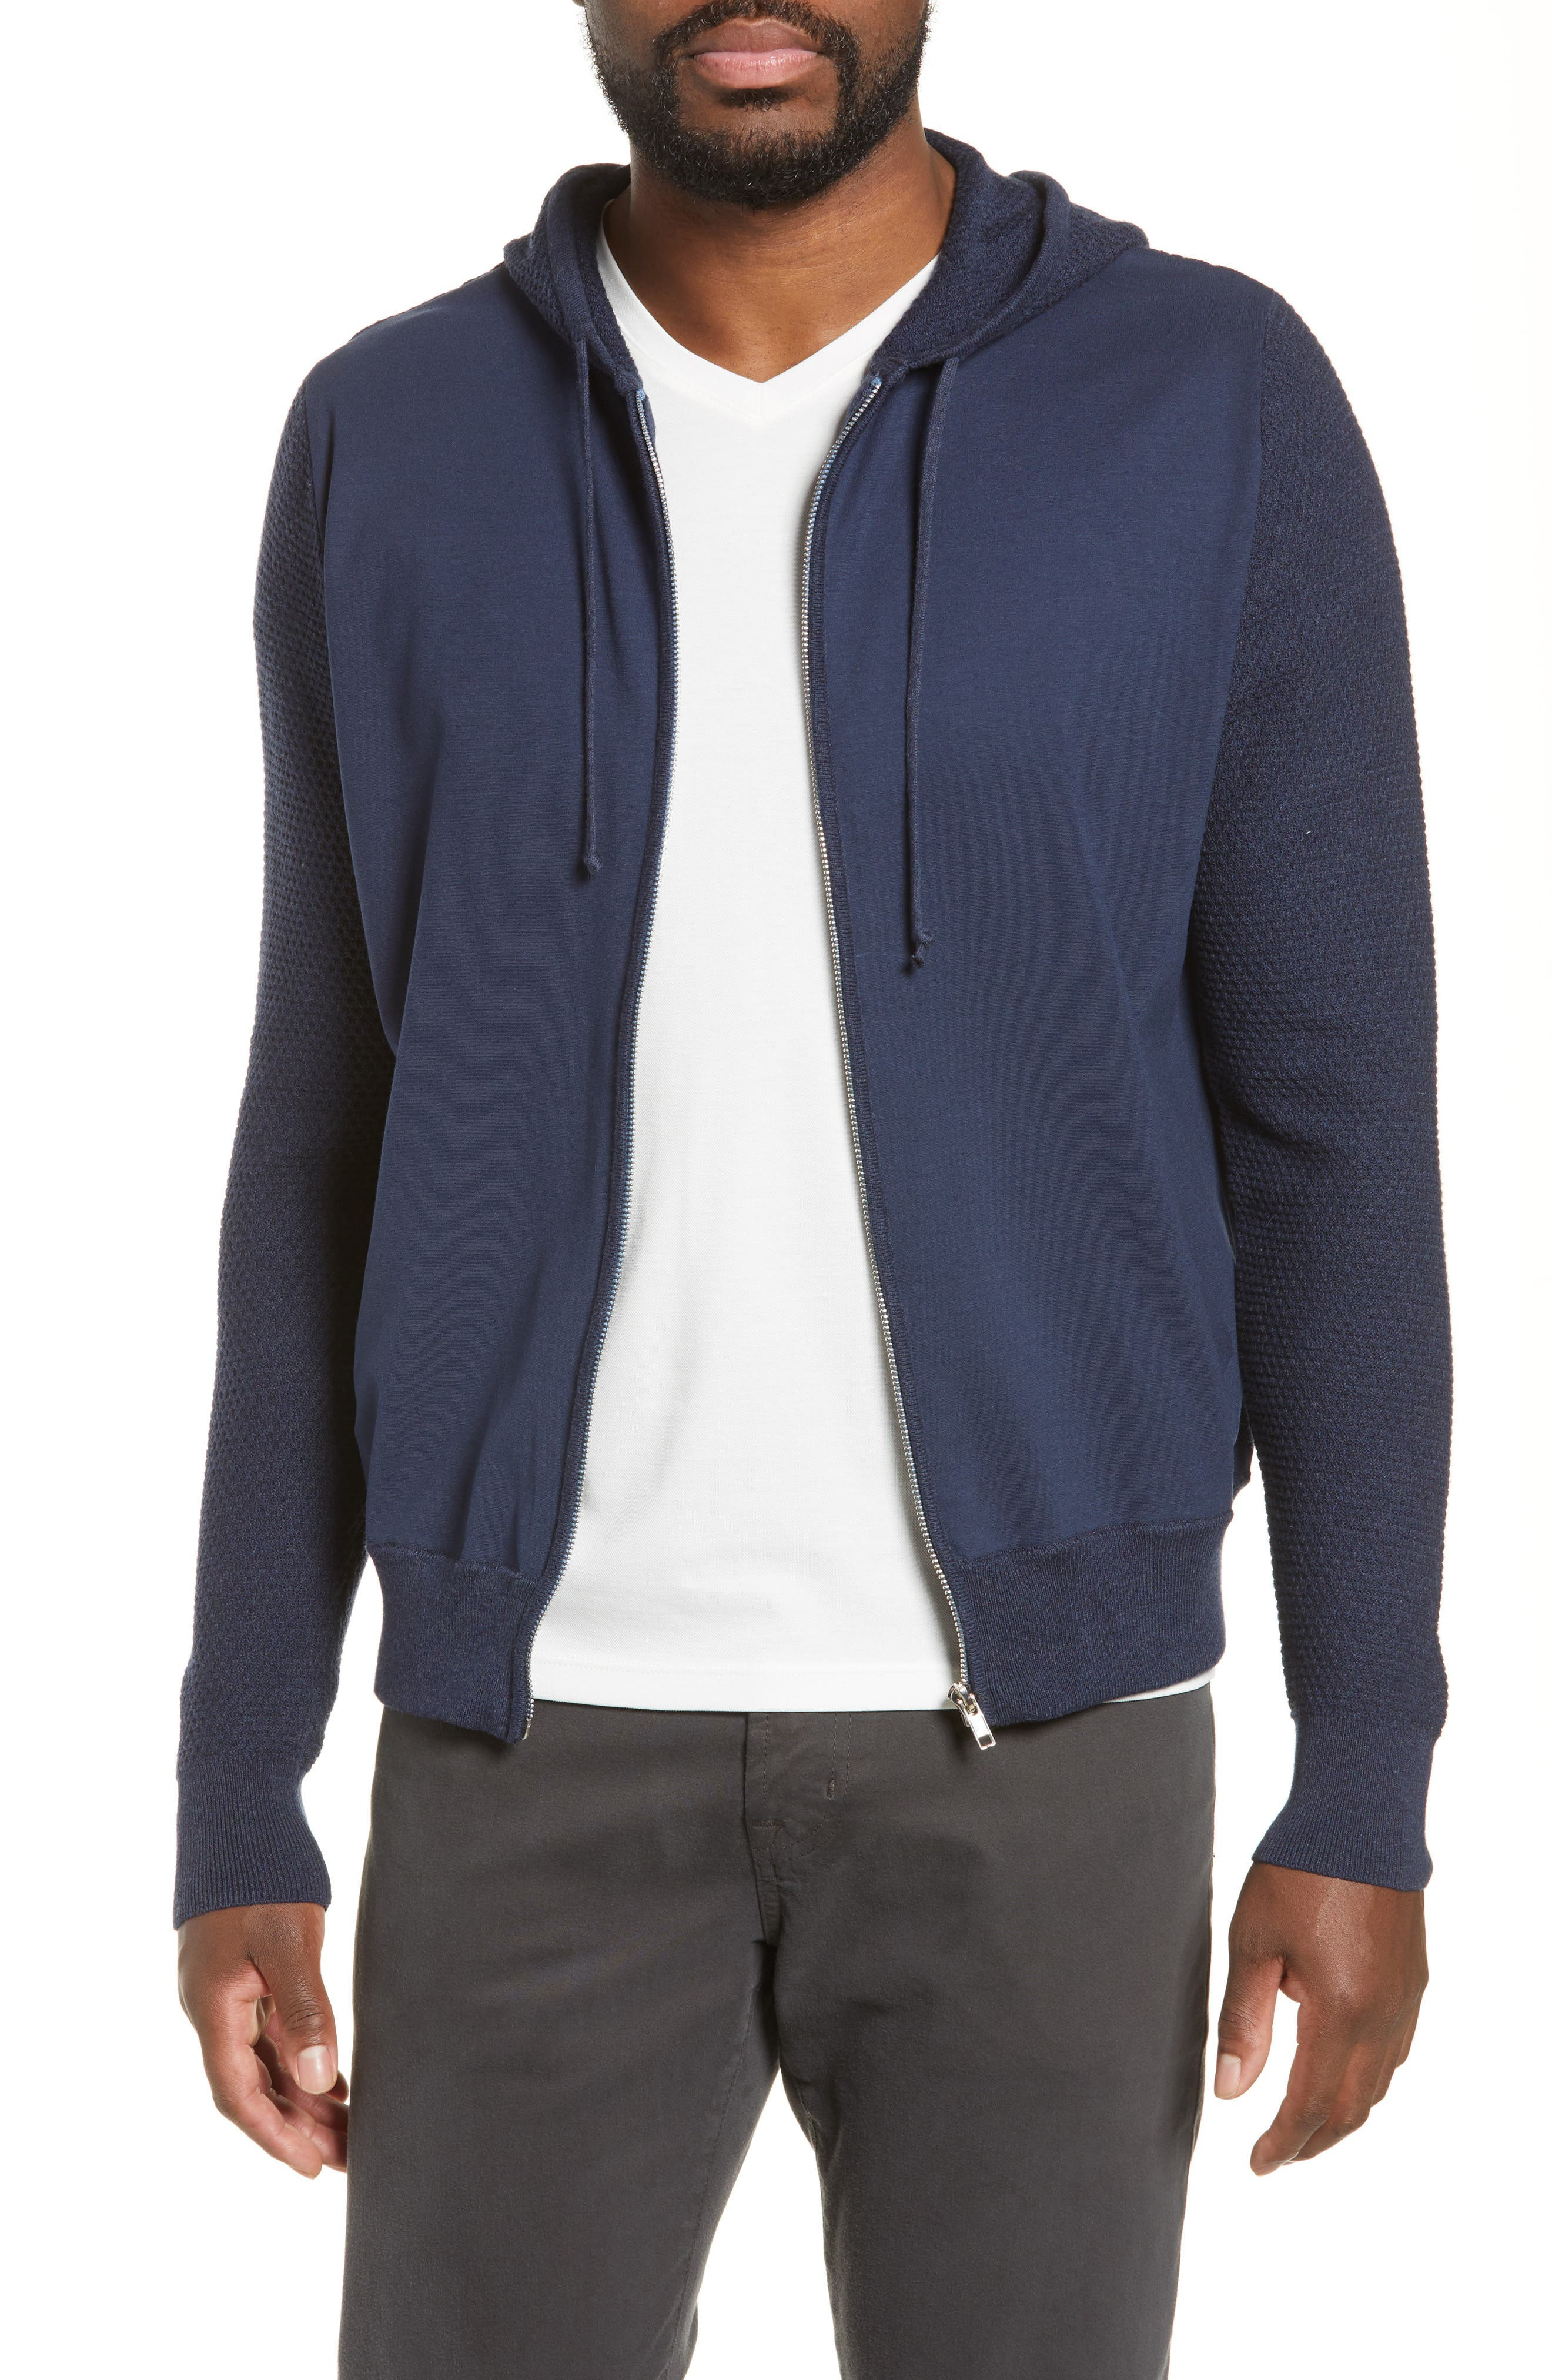 ZACHARY PRELL Cedarhurst Hooded Zip Sweater, Main, color, NAVY